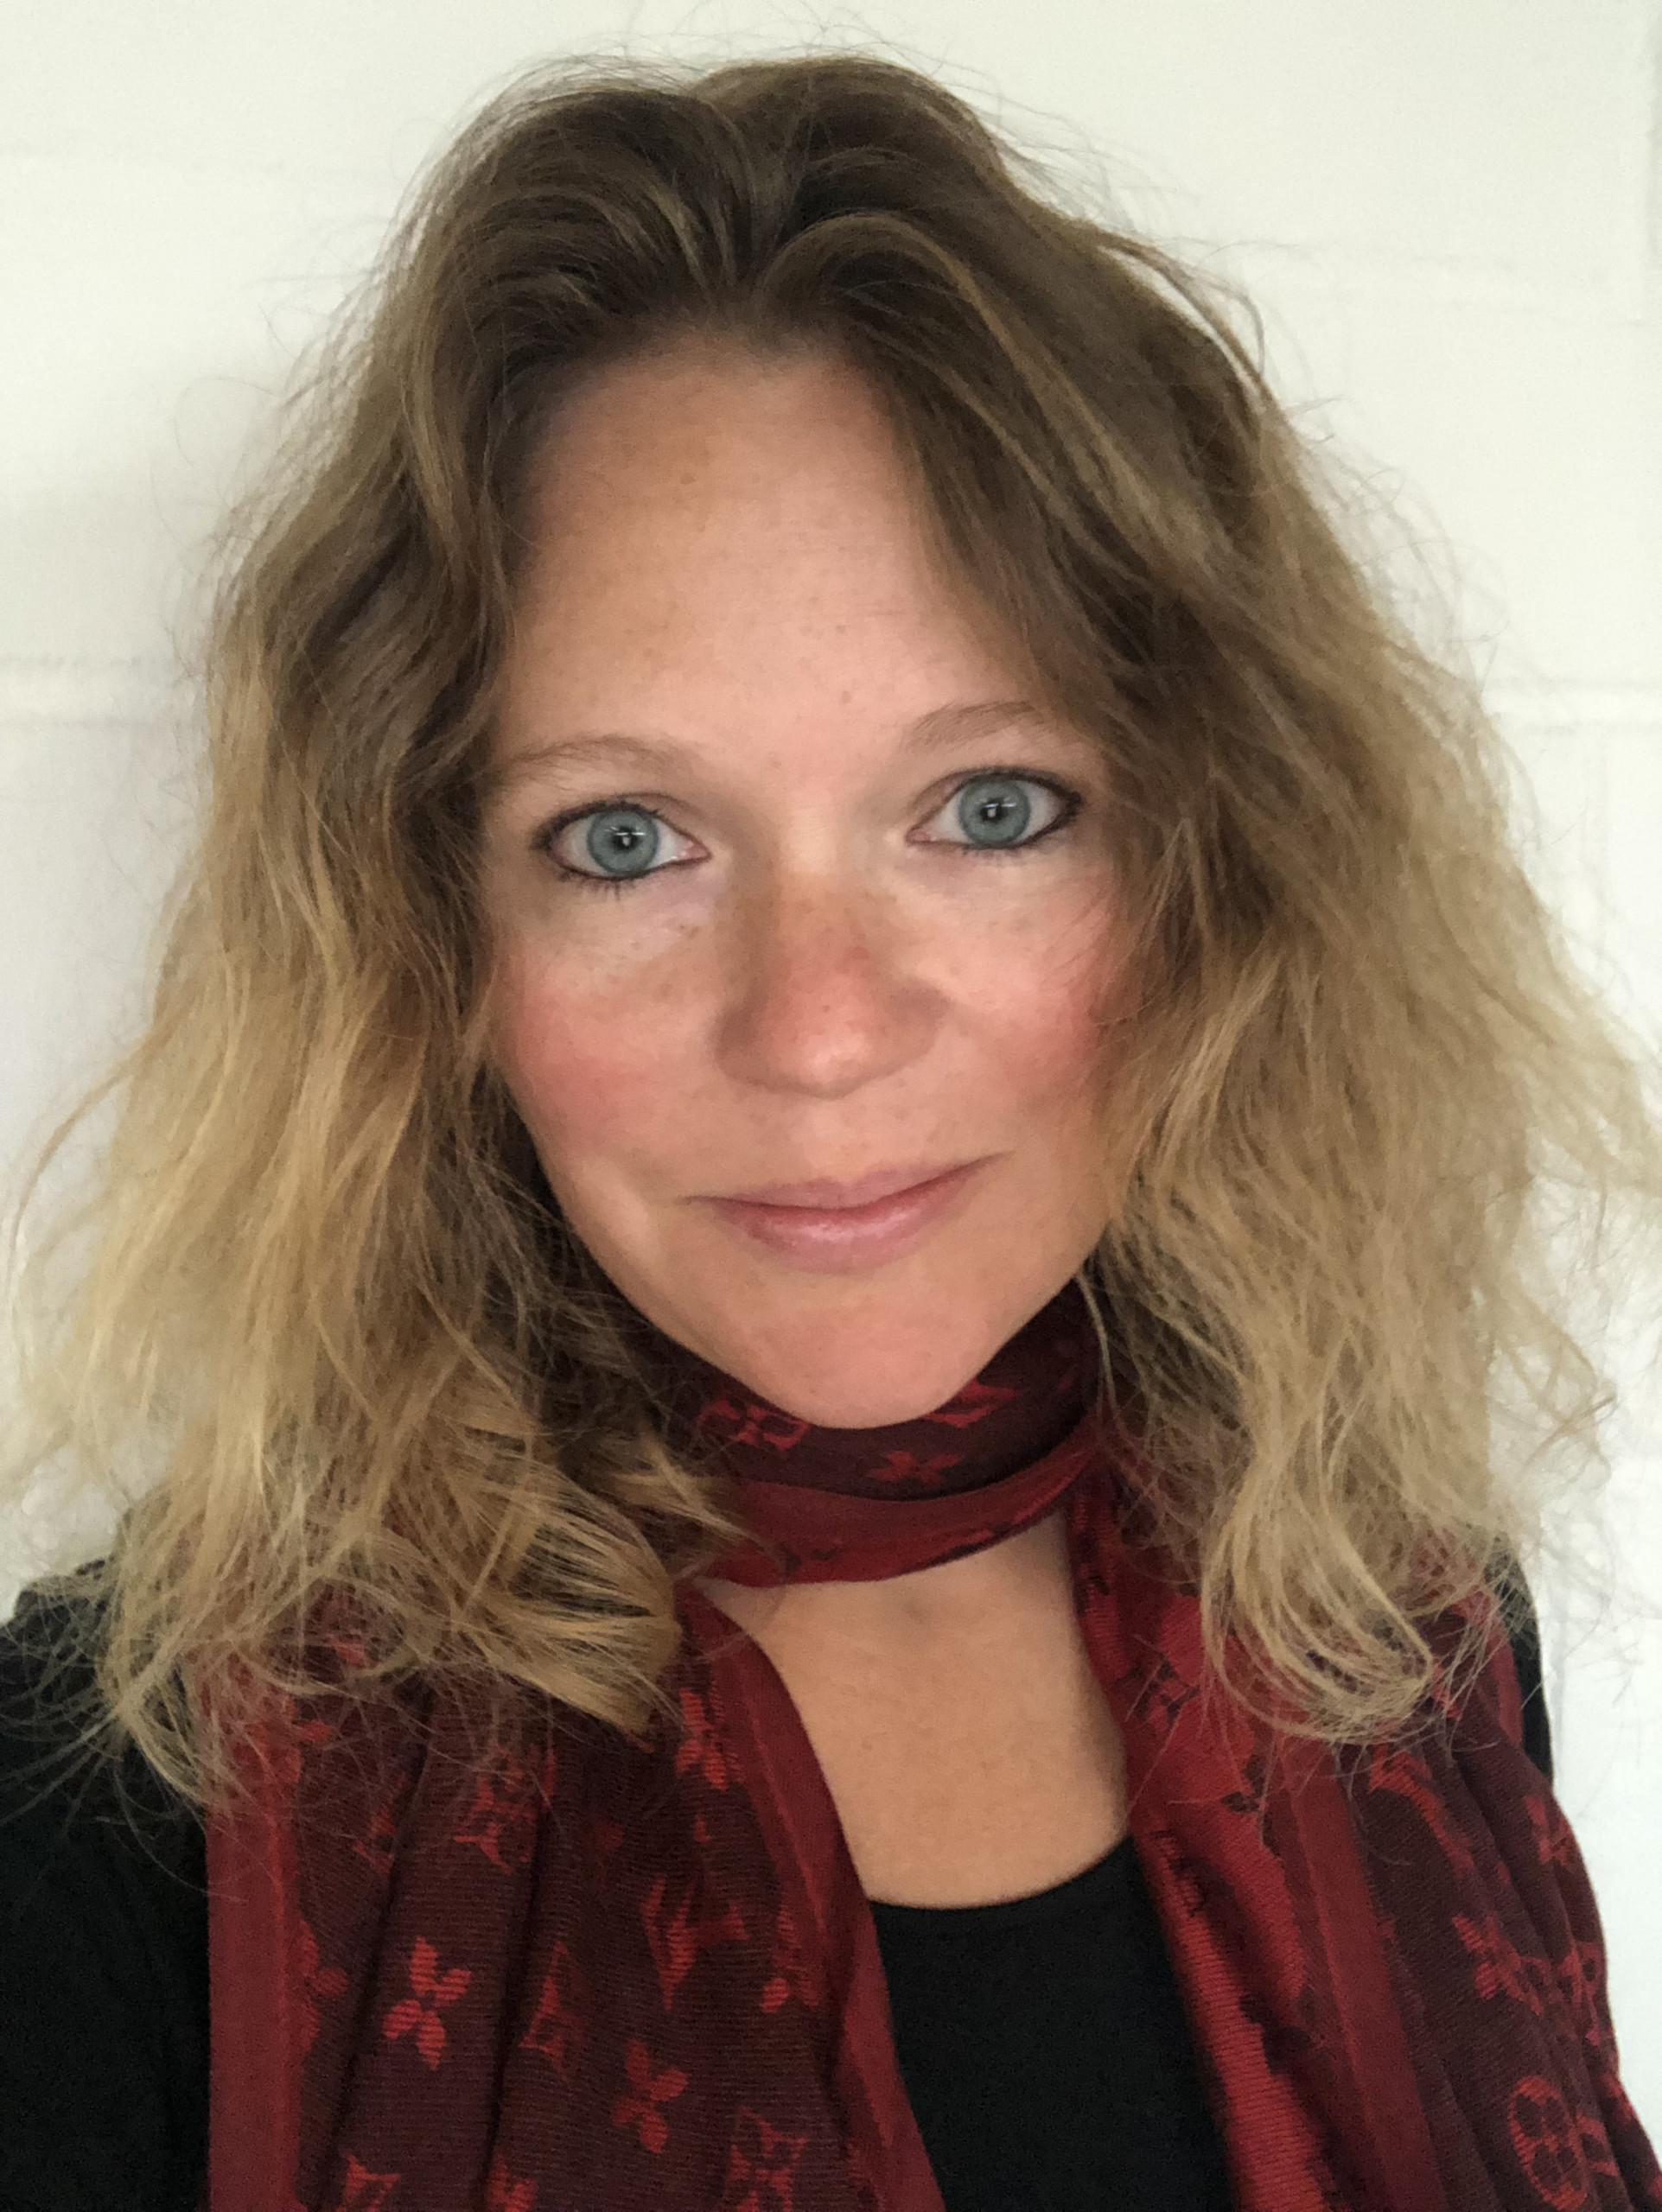 Team: Dr. Inka Engel